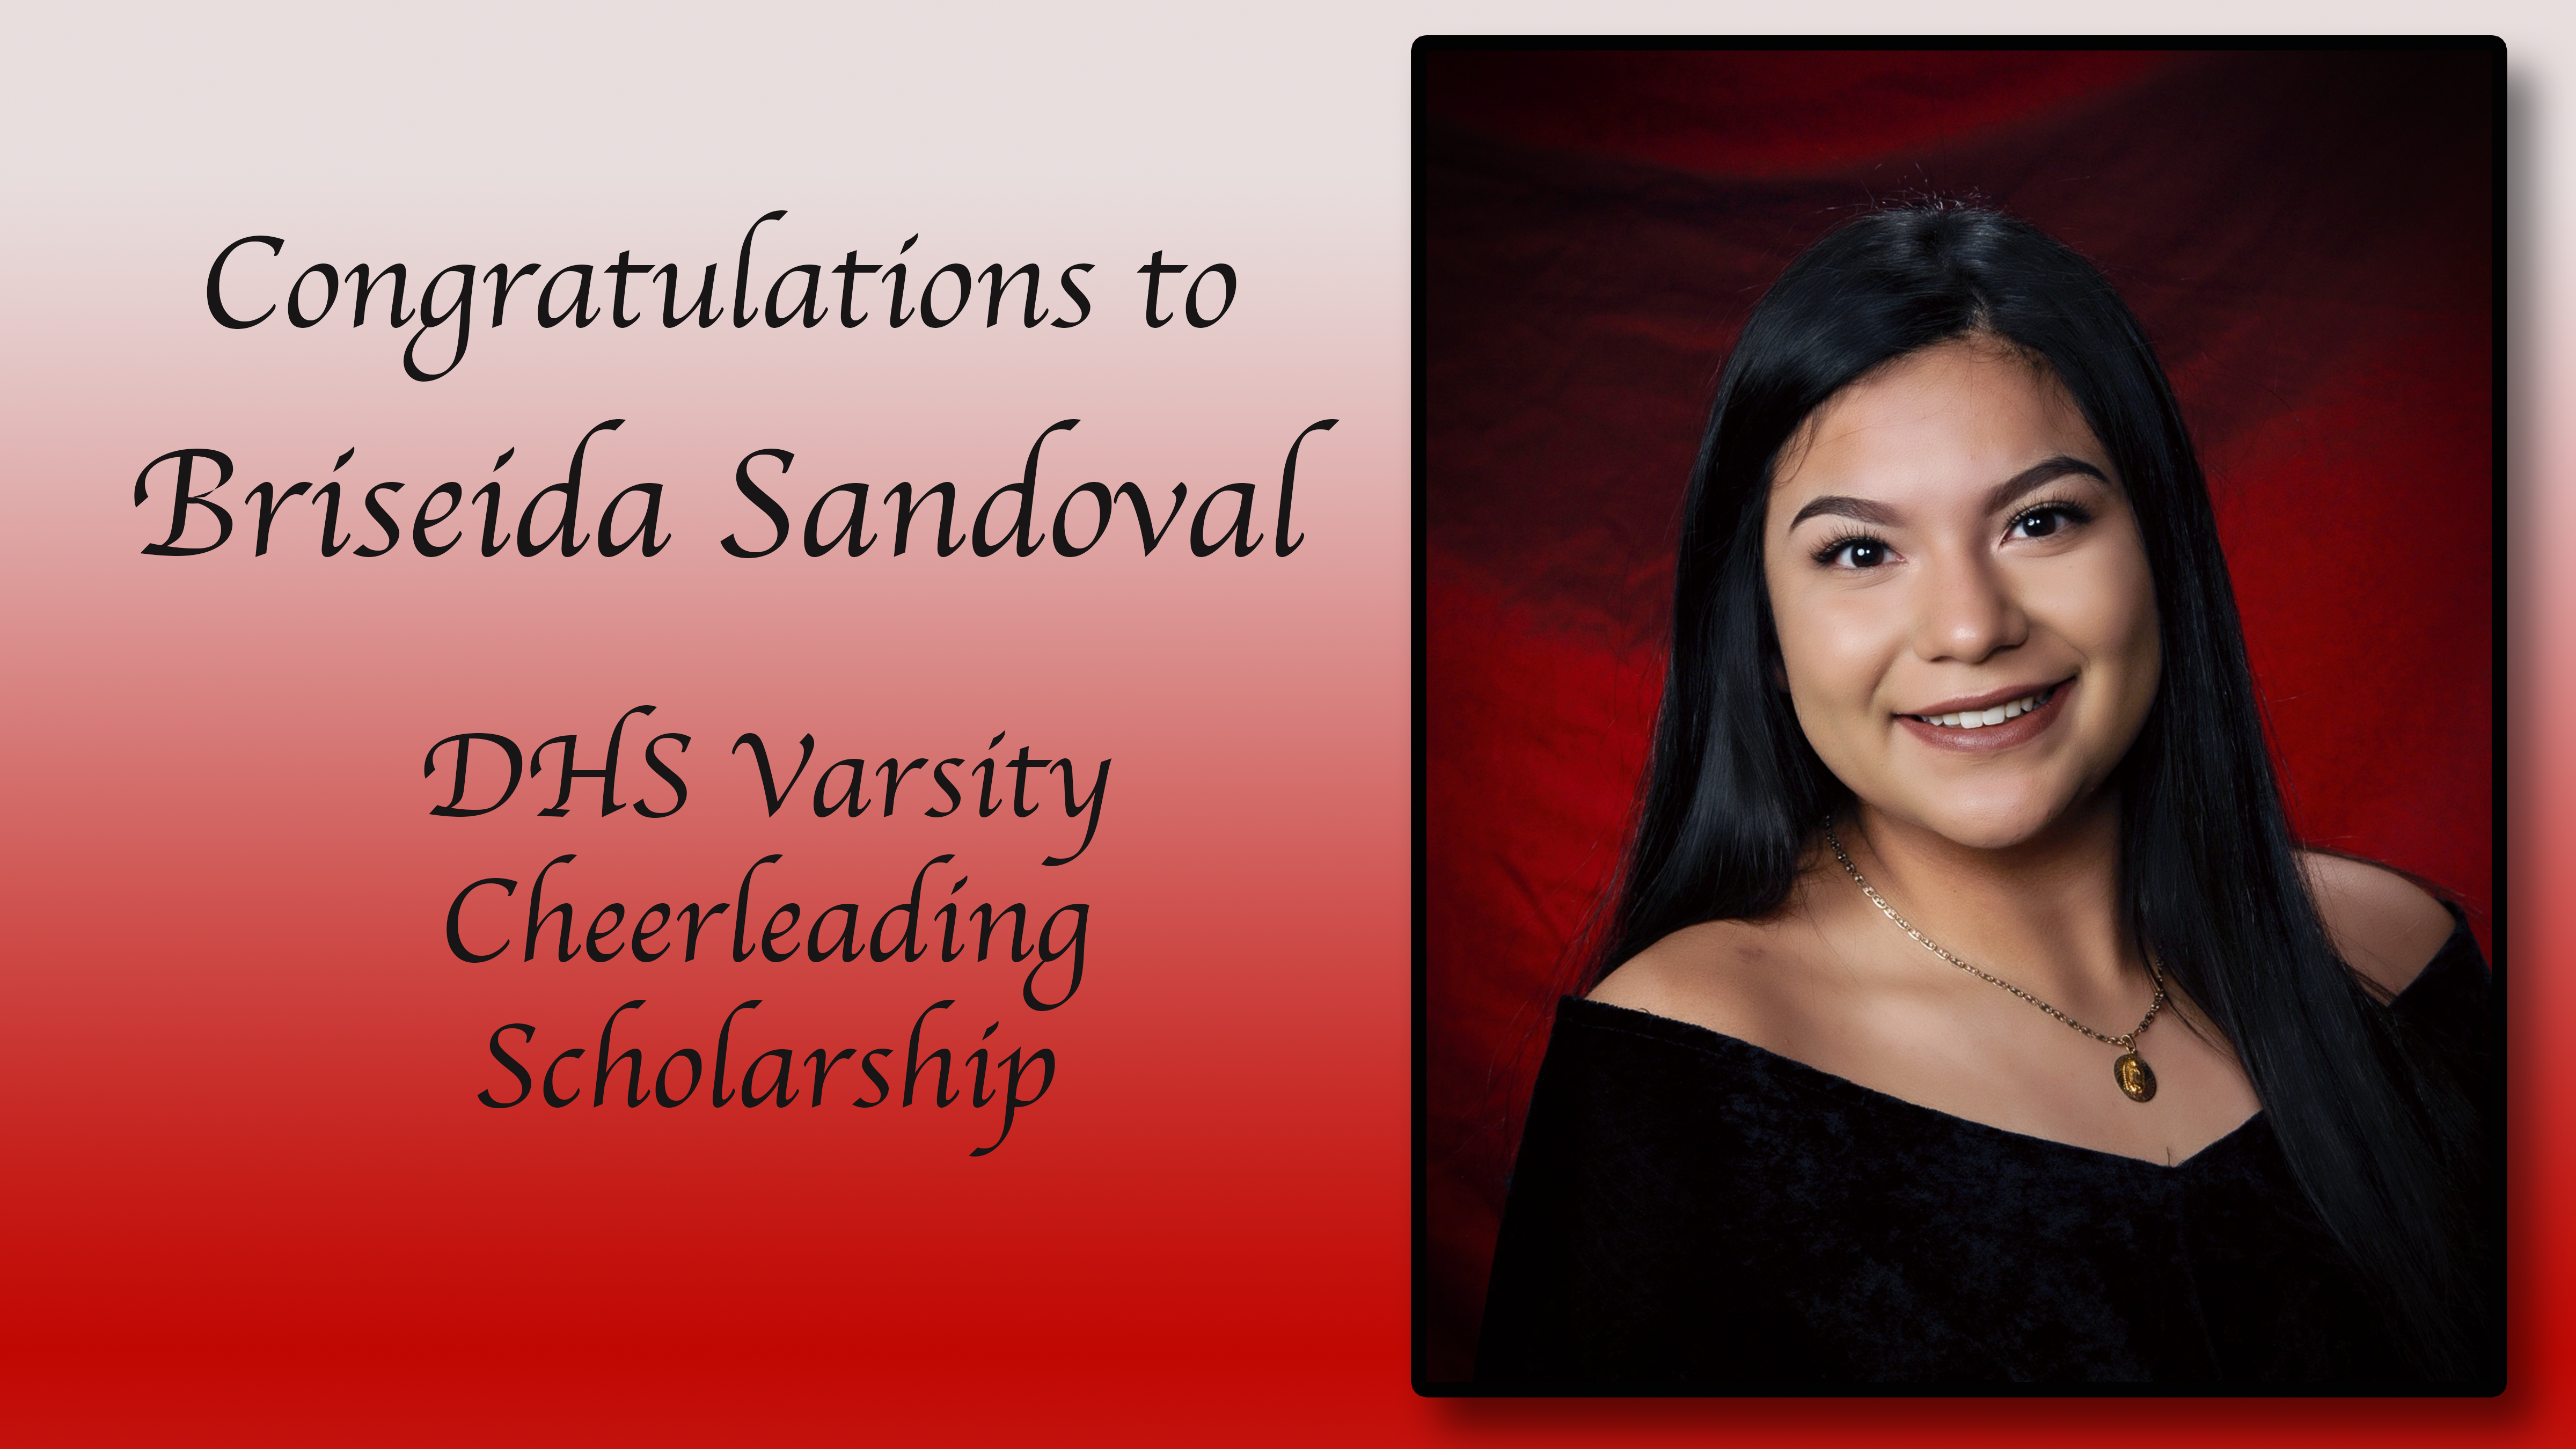 Briseida Sandoval Scholarship